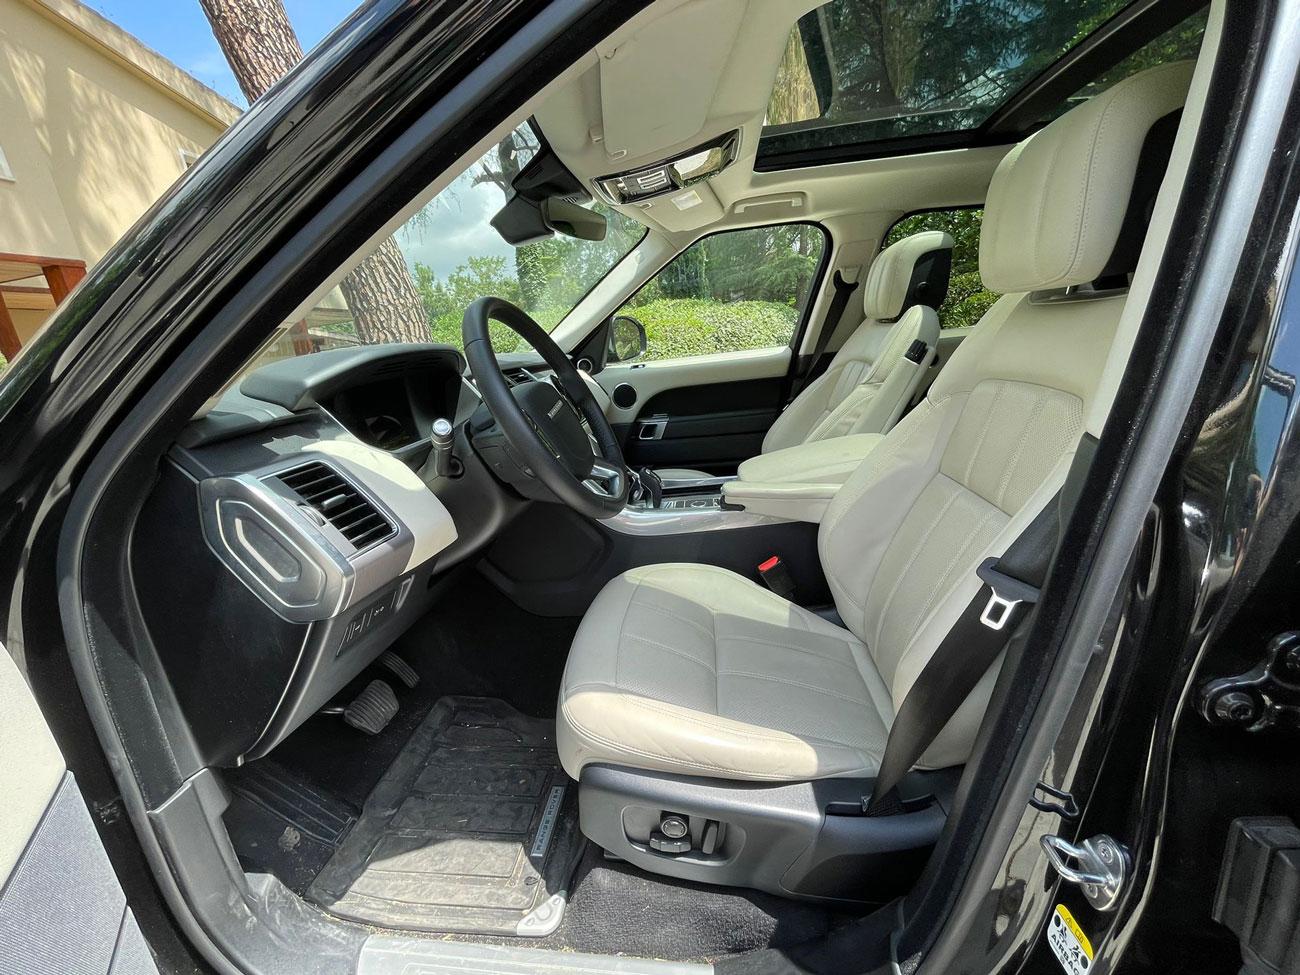 Range-Rover-Sport-Rental-Ibiza-4